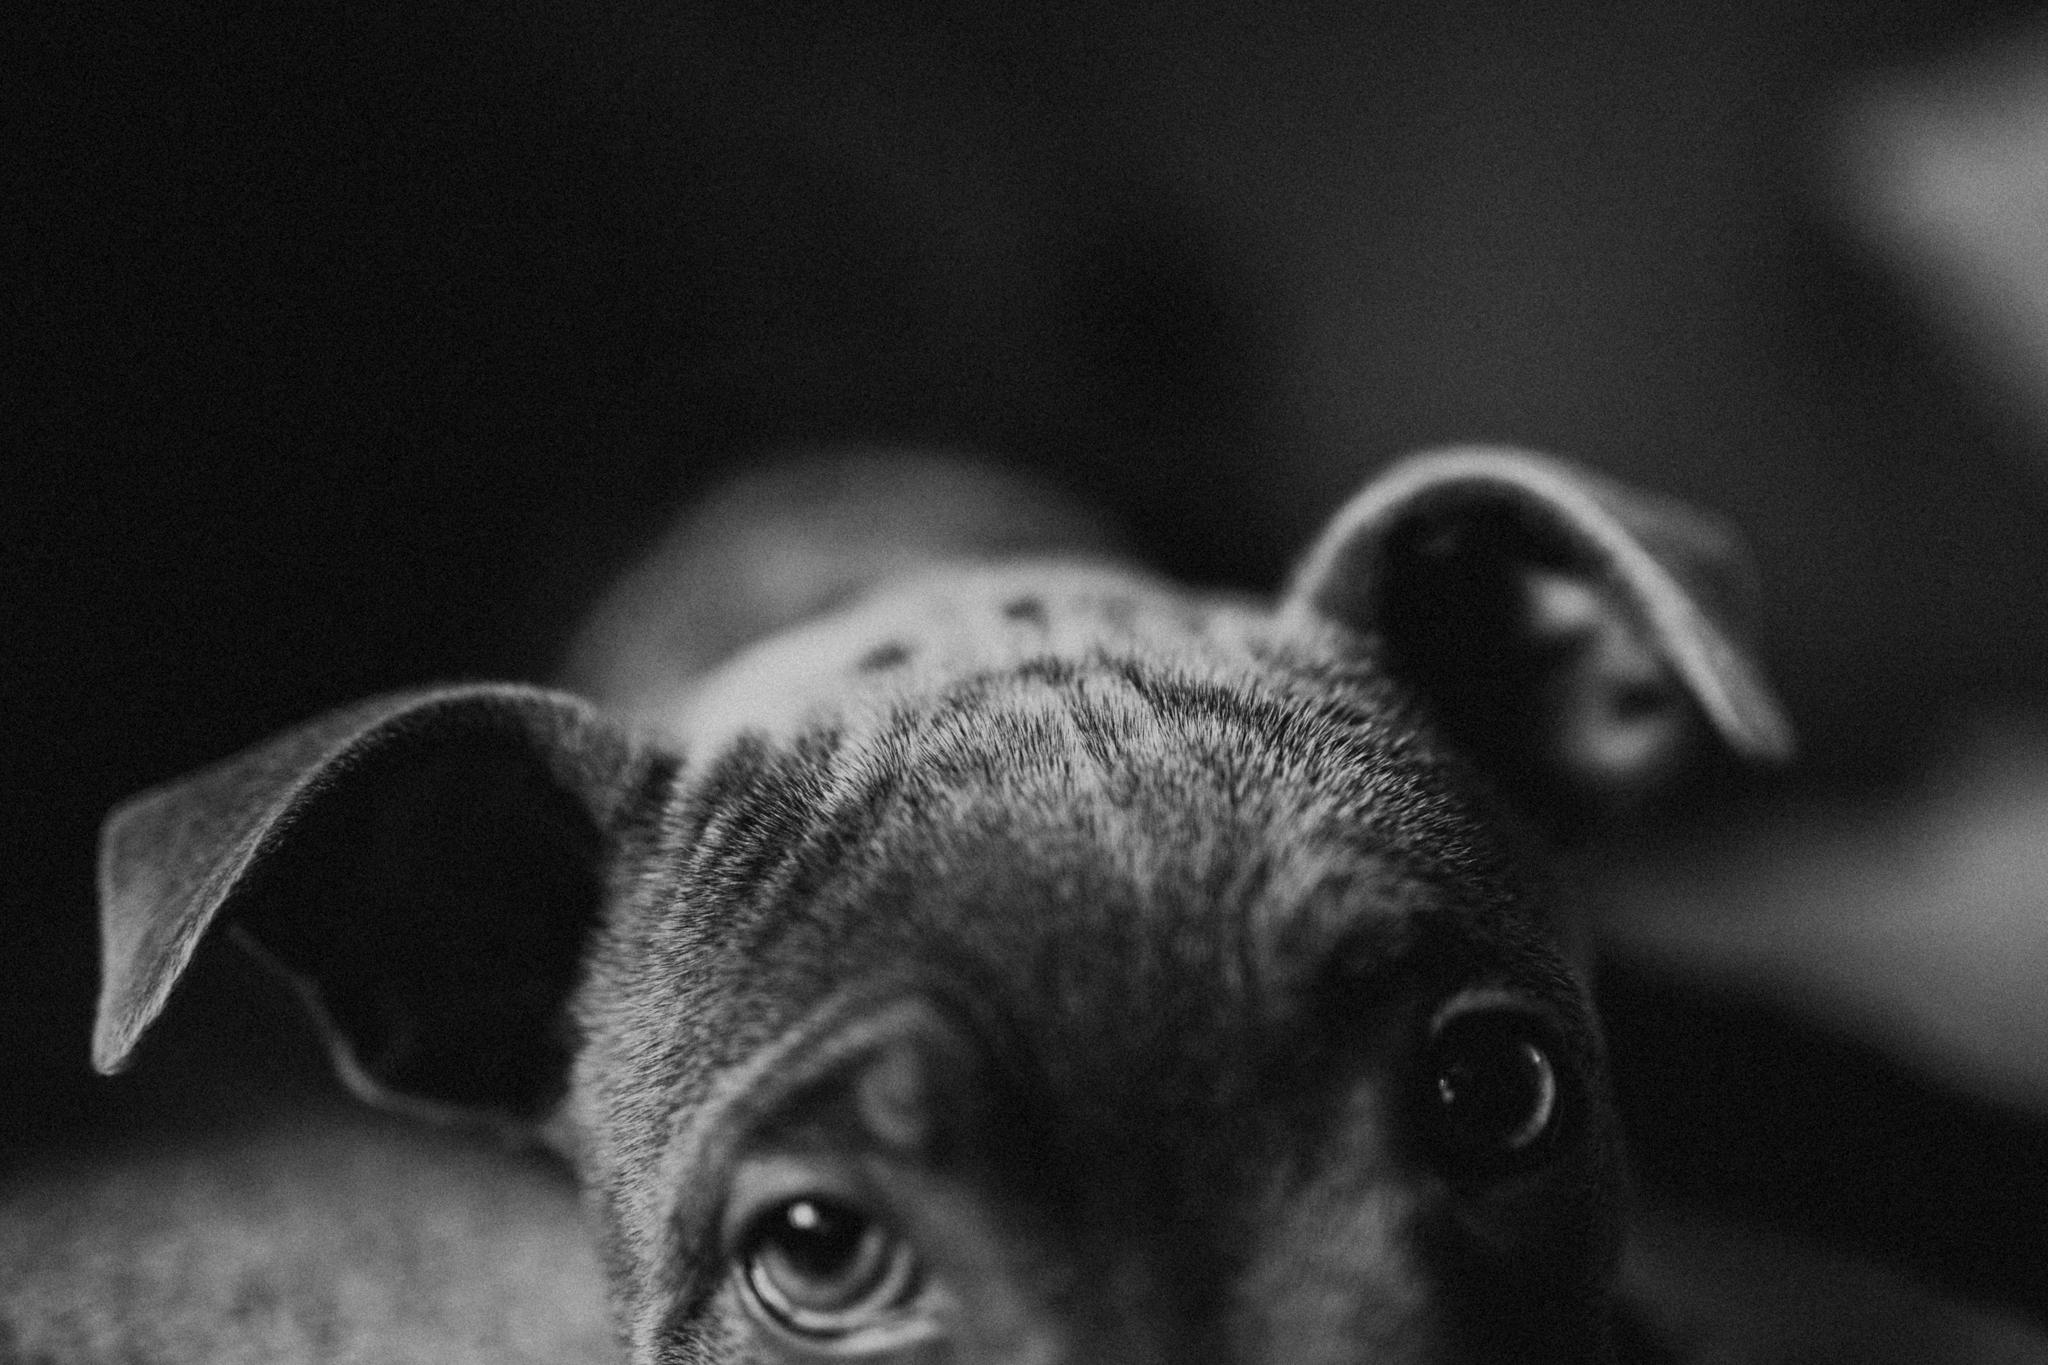 Dog-Human-Session-Photography-Darina-Stoda-Animal-Indigo-19.jpg